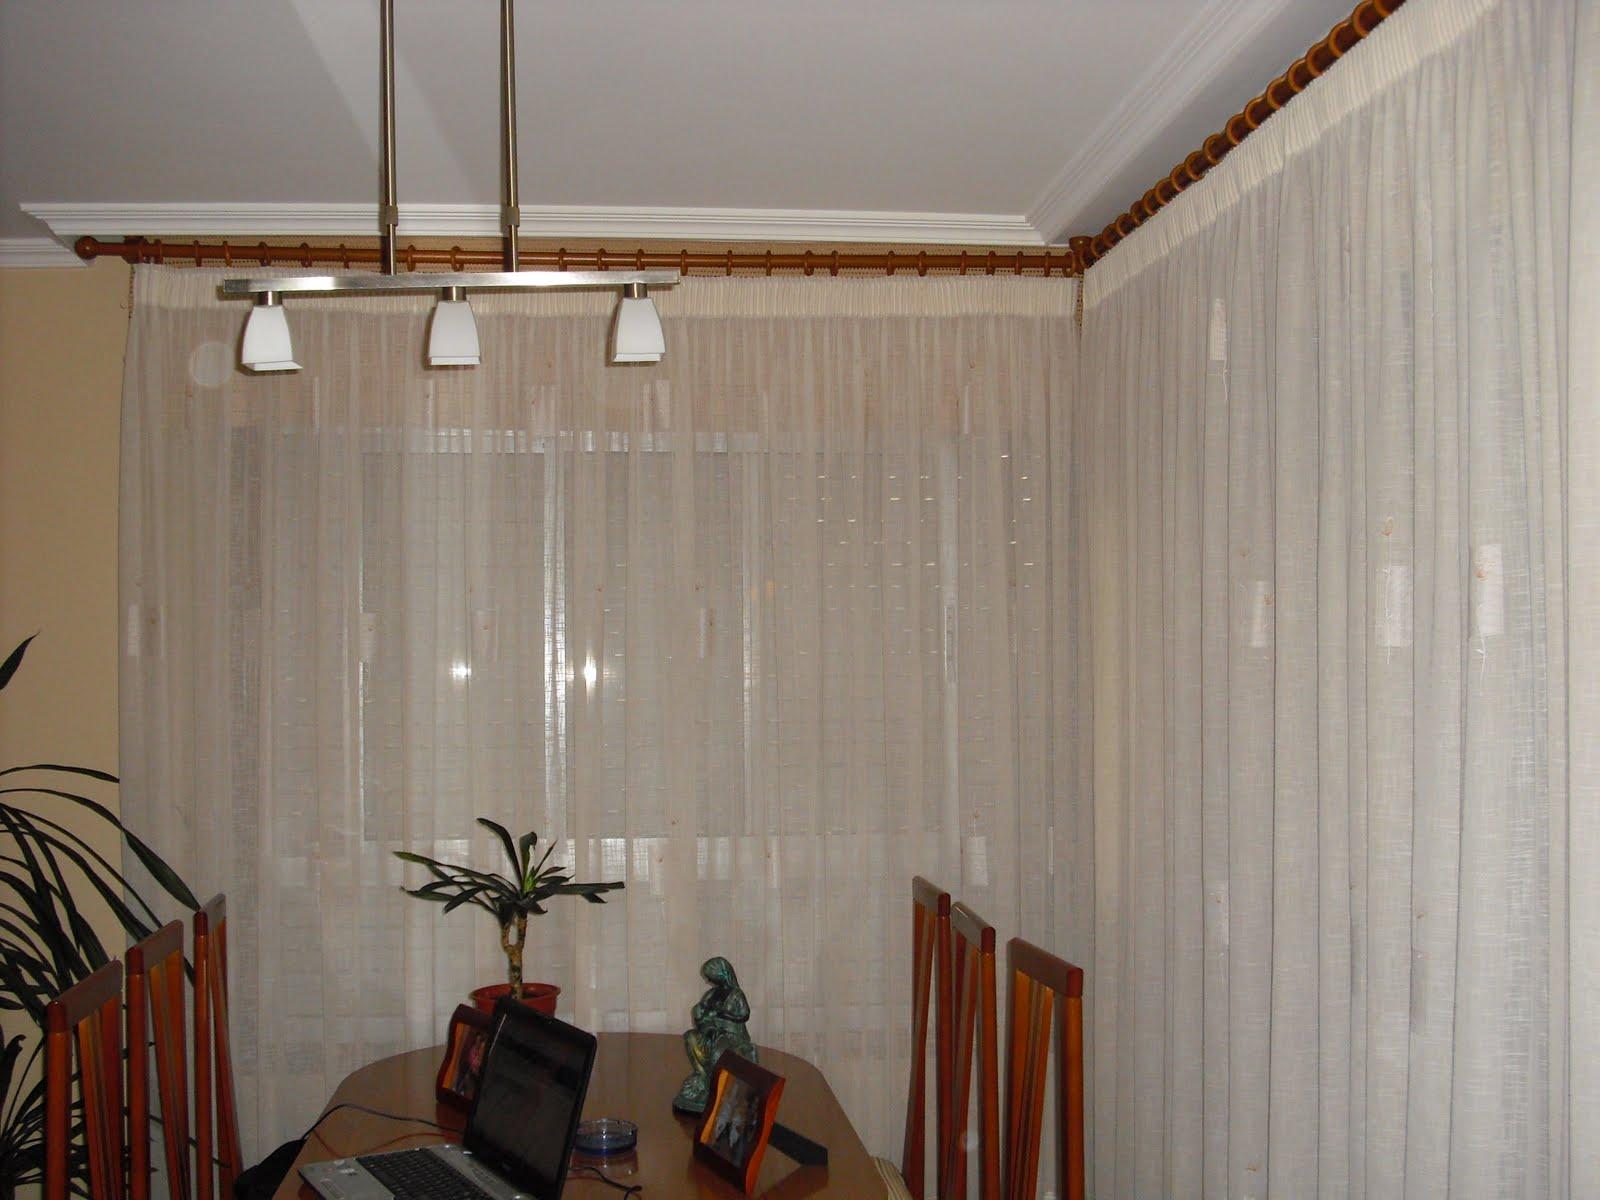 Visillos para salones 489 salon ideas - Visillos para salones ...